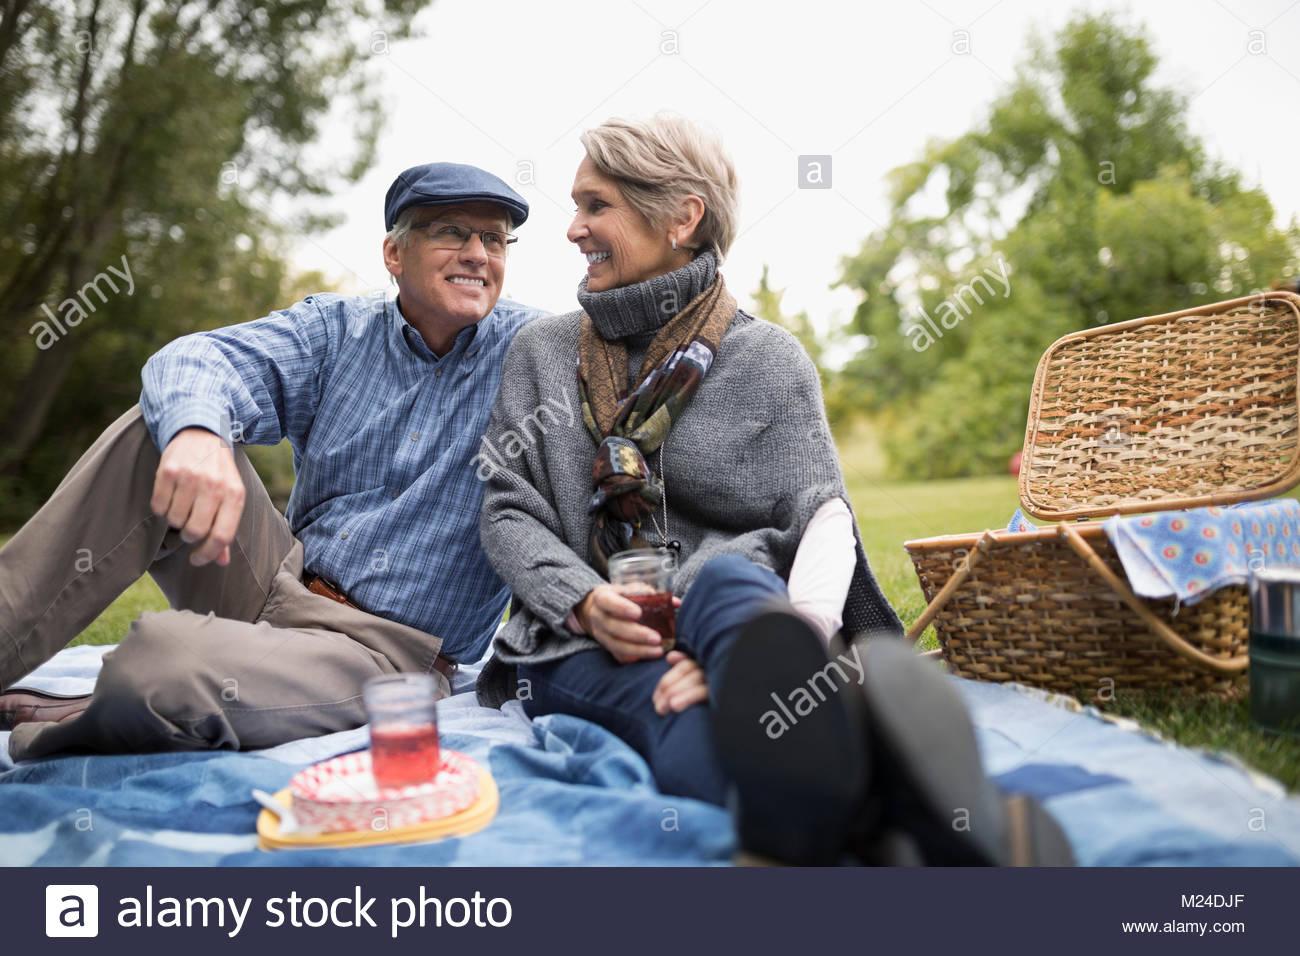 Senior couple enjoying picnic in park - Stock Image